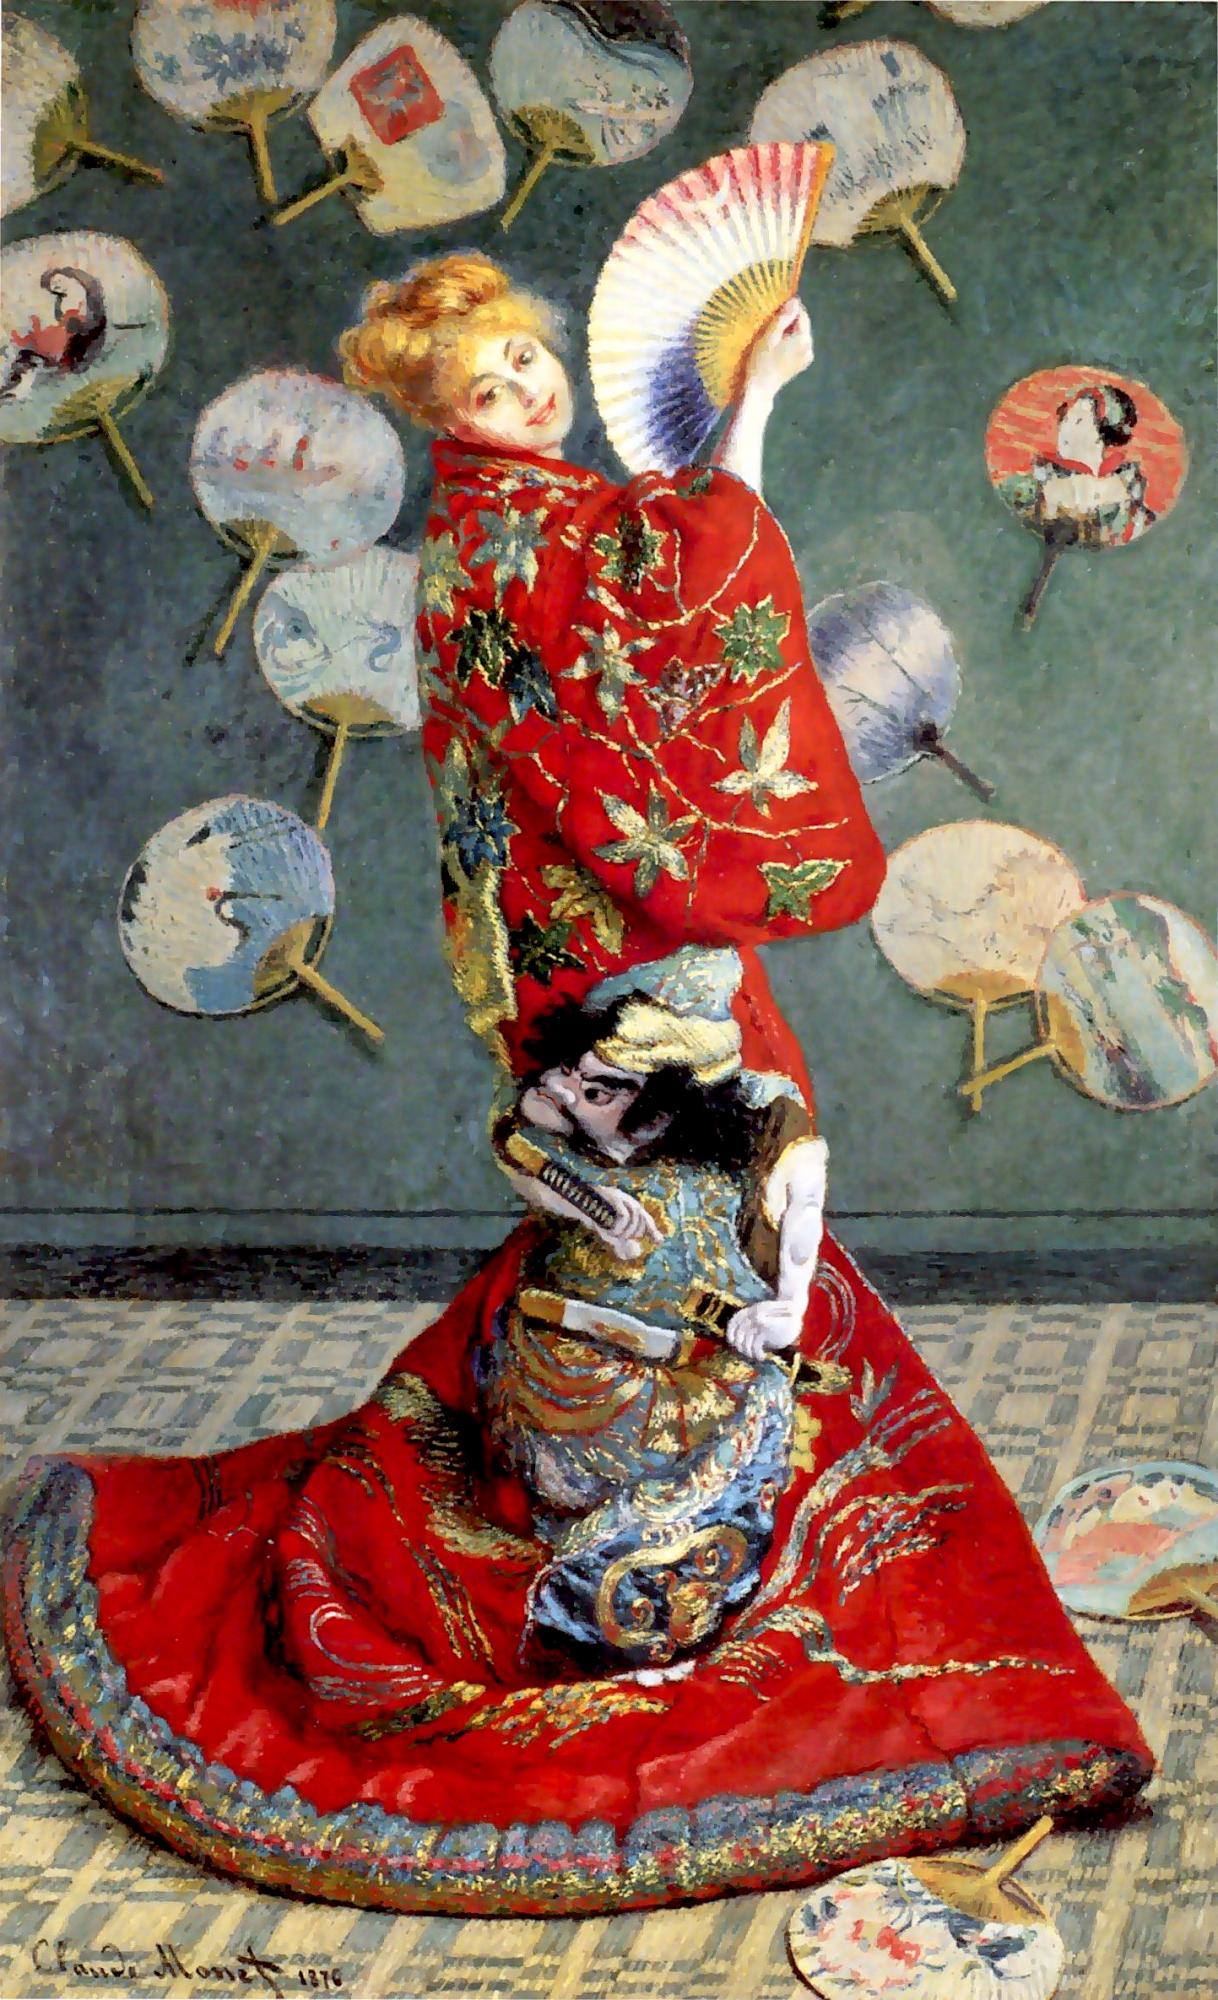 obra de Claude Monet